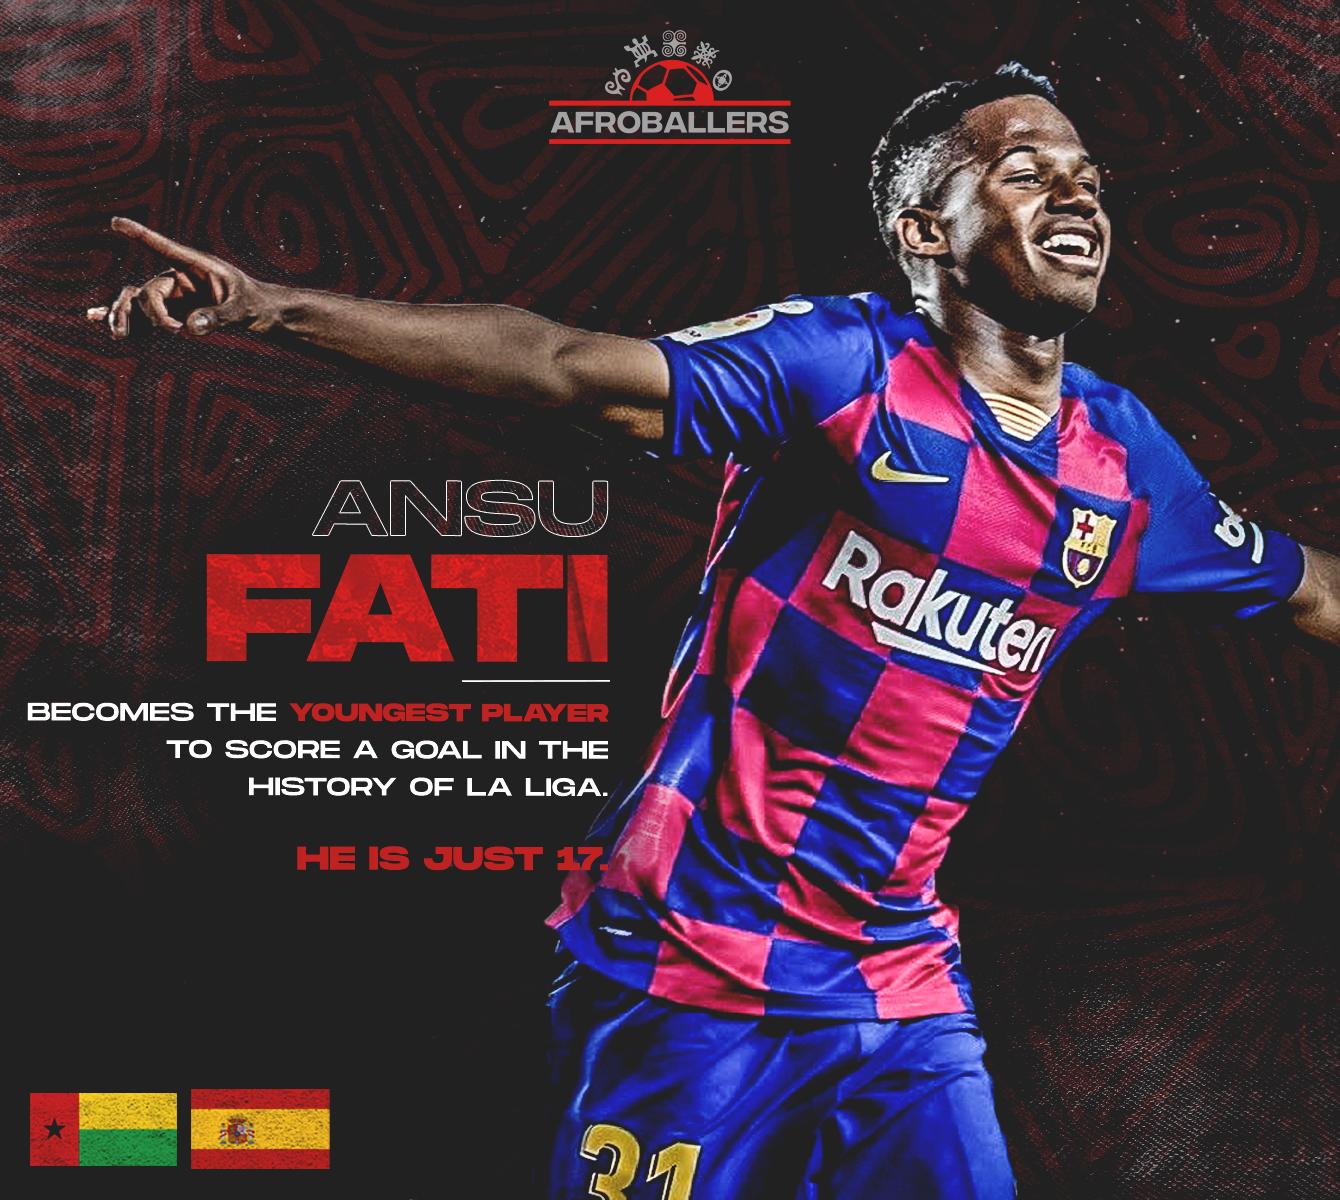 Ansu Fati Scored Twice To Help Barcelona Win Over Levante Afroballers